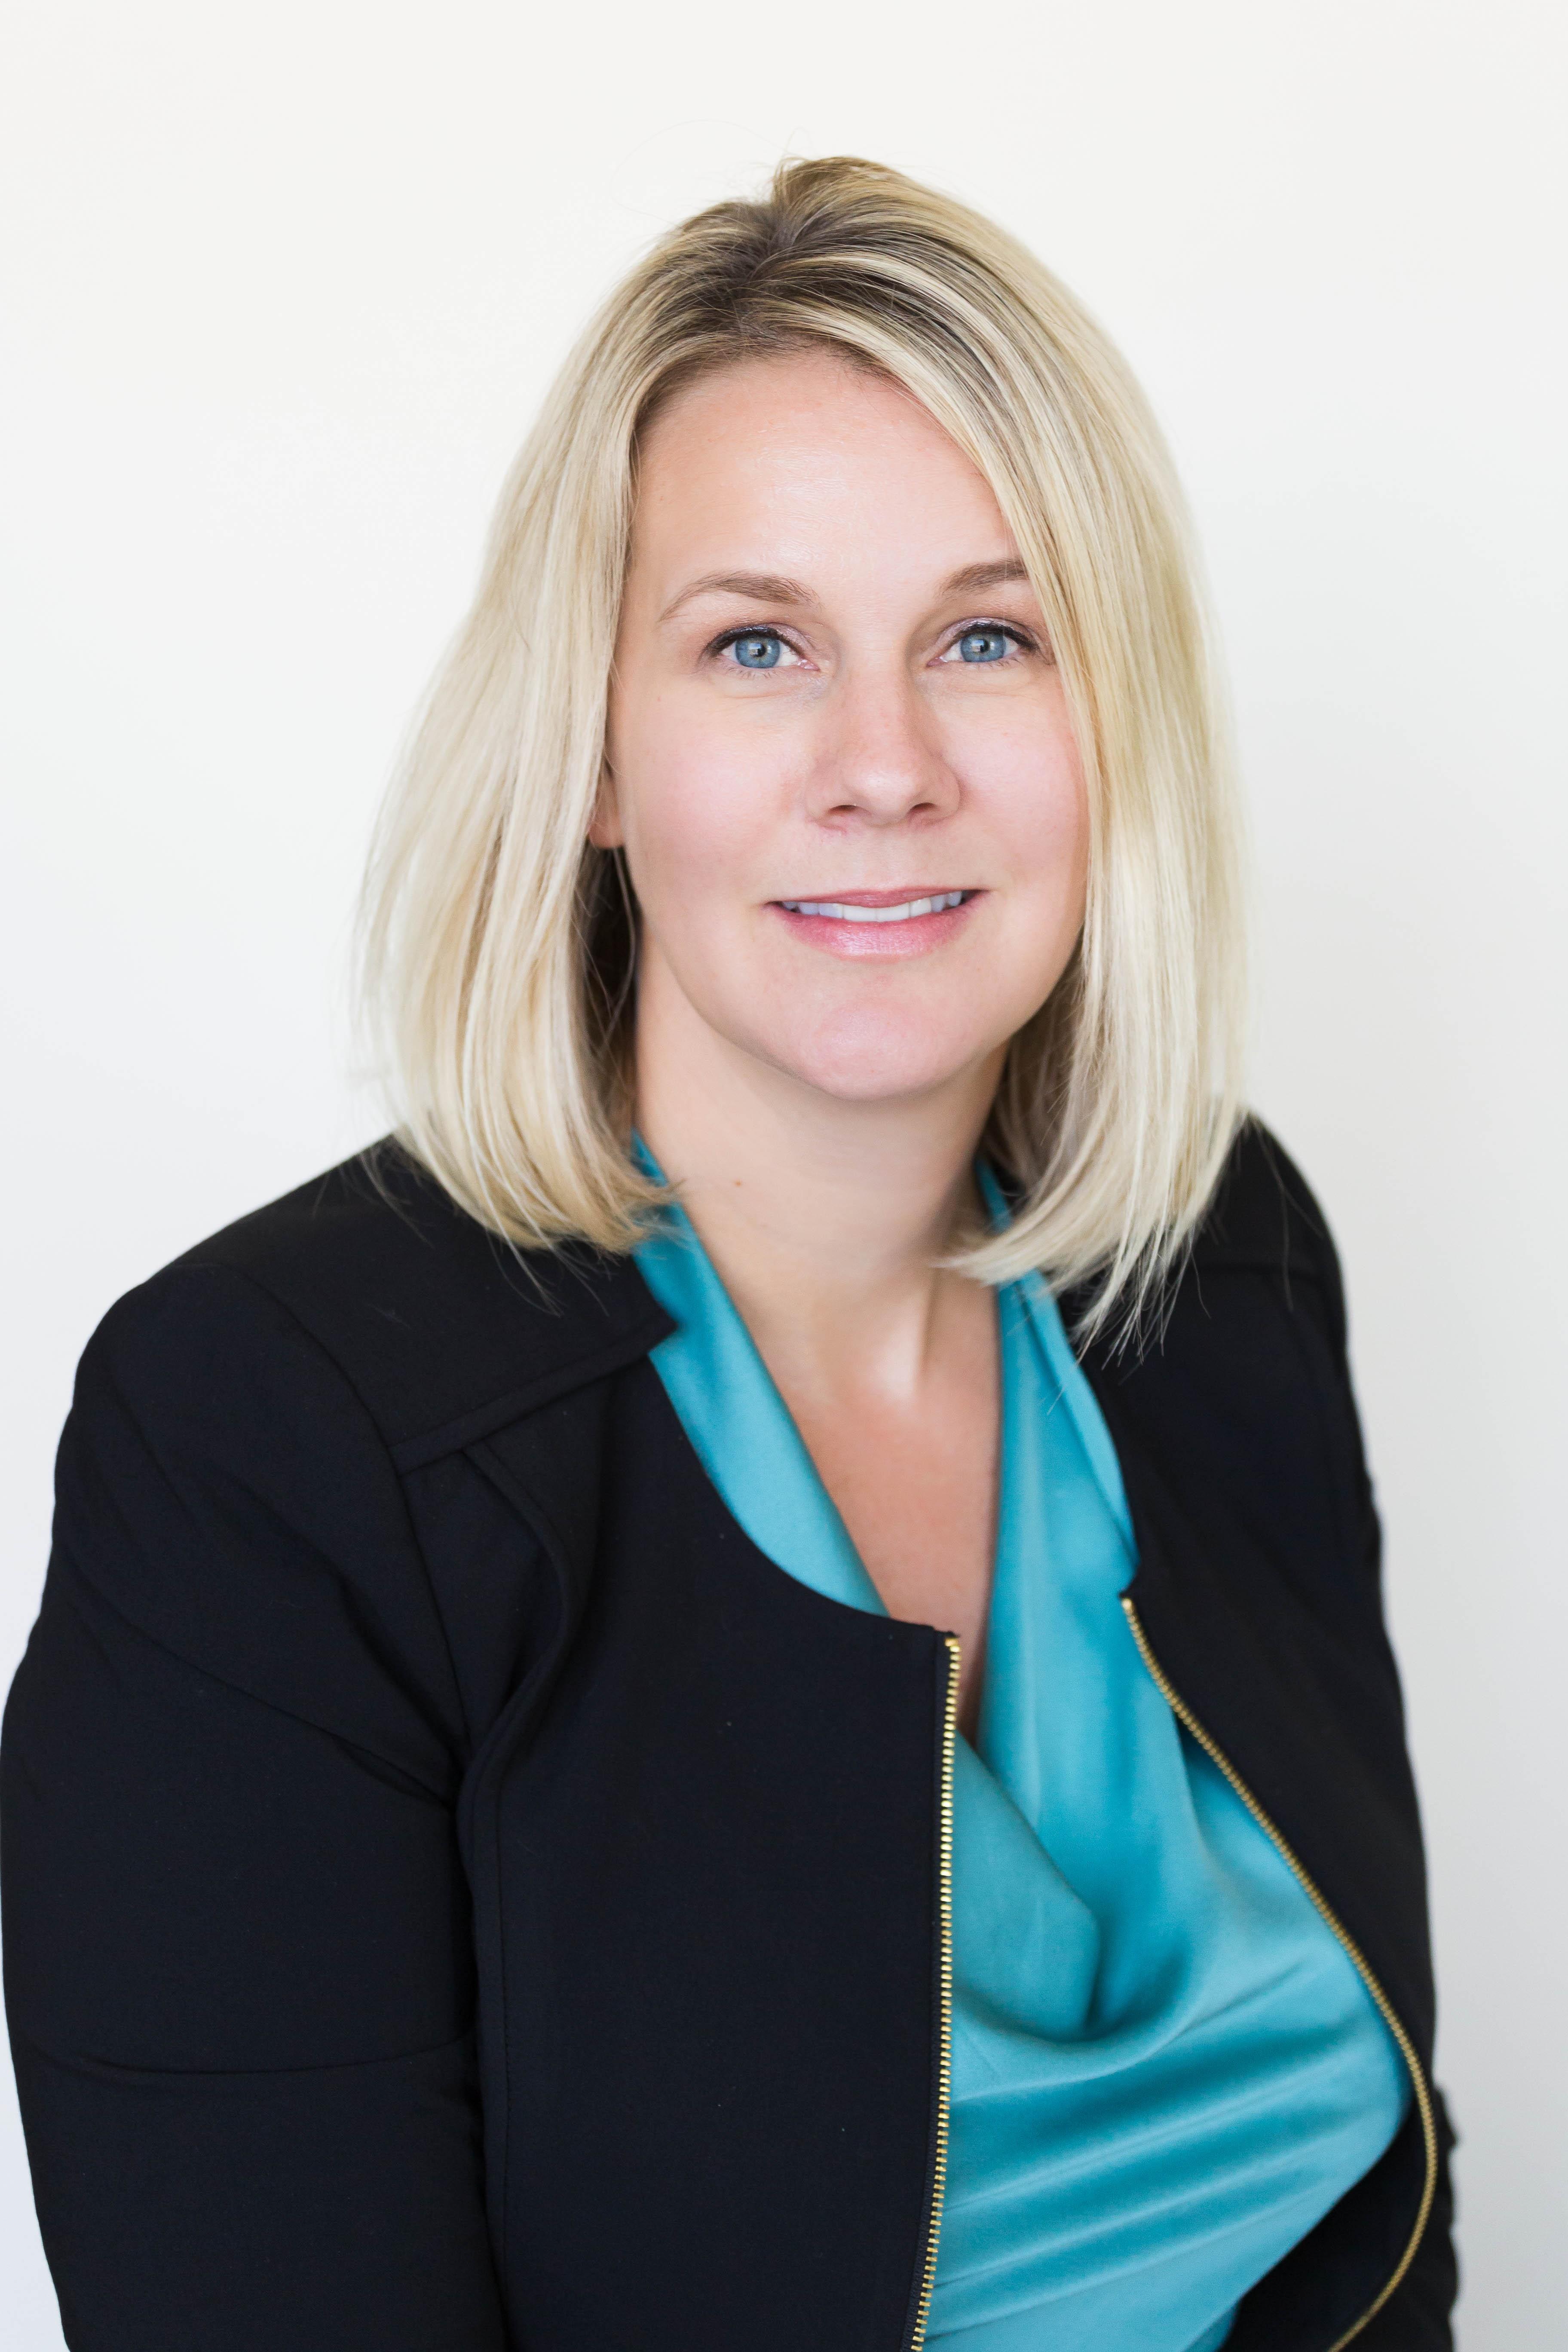 Heather Elzi, Treasurer